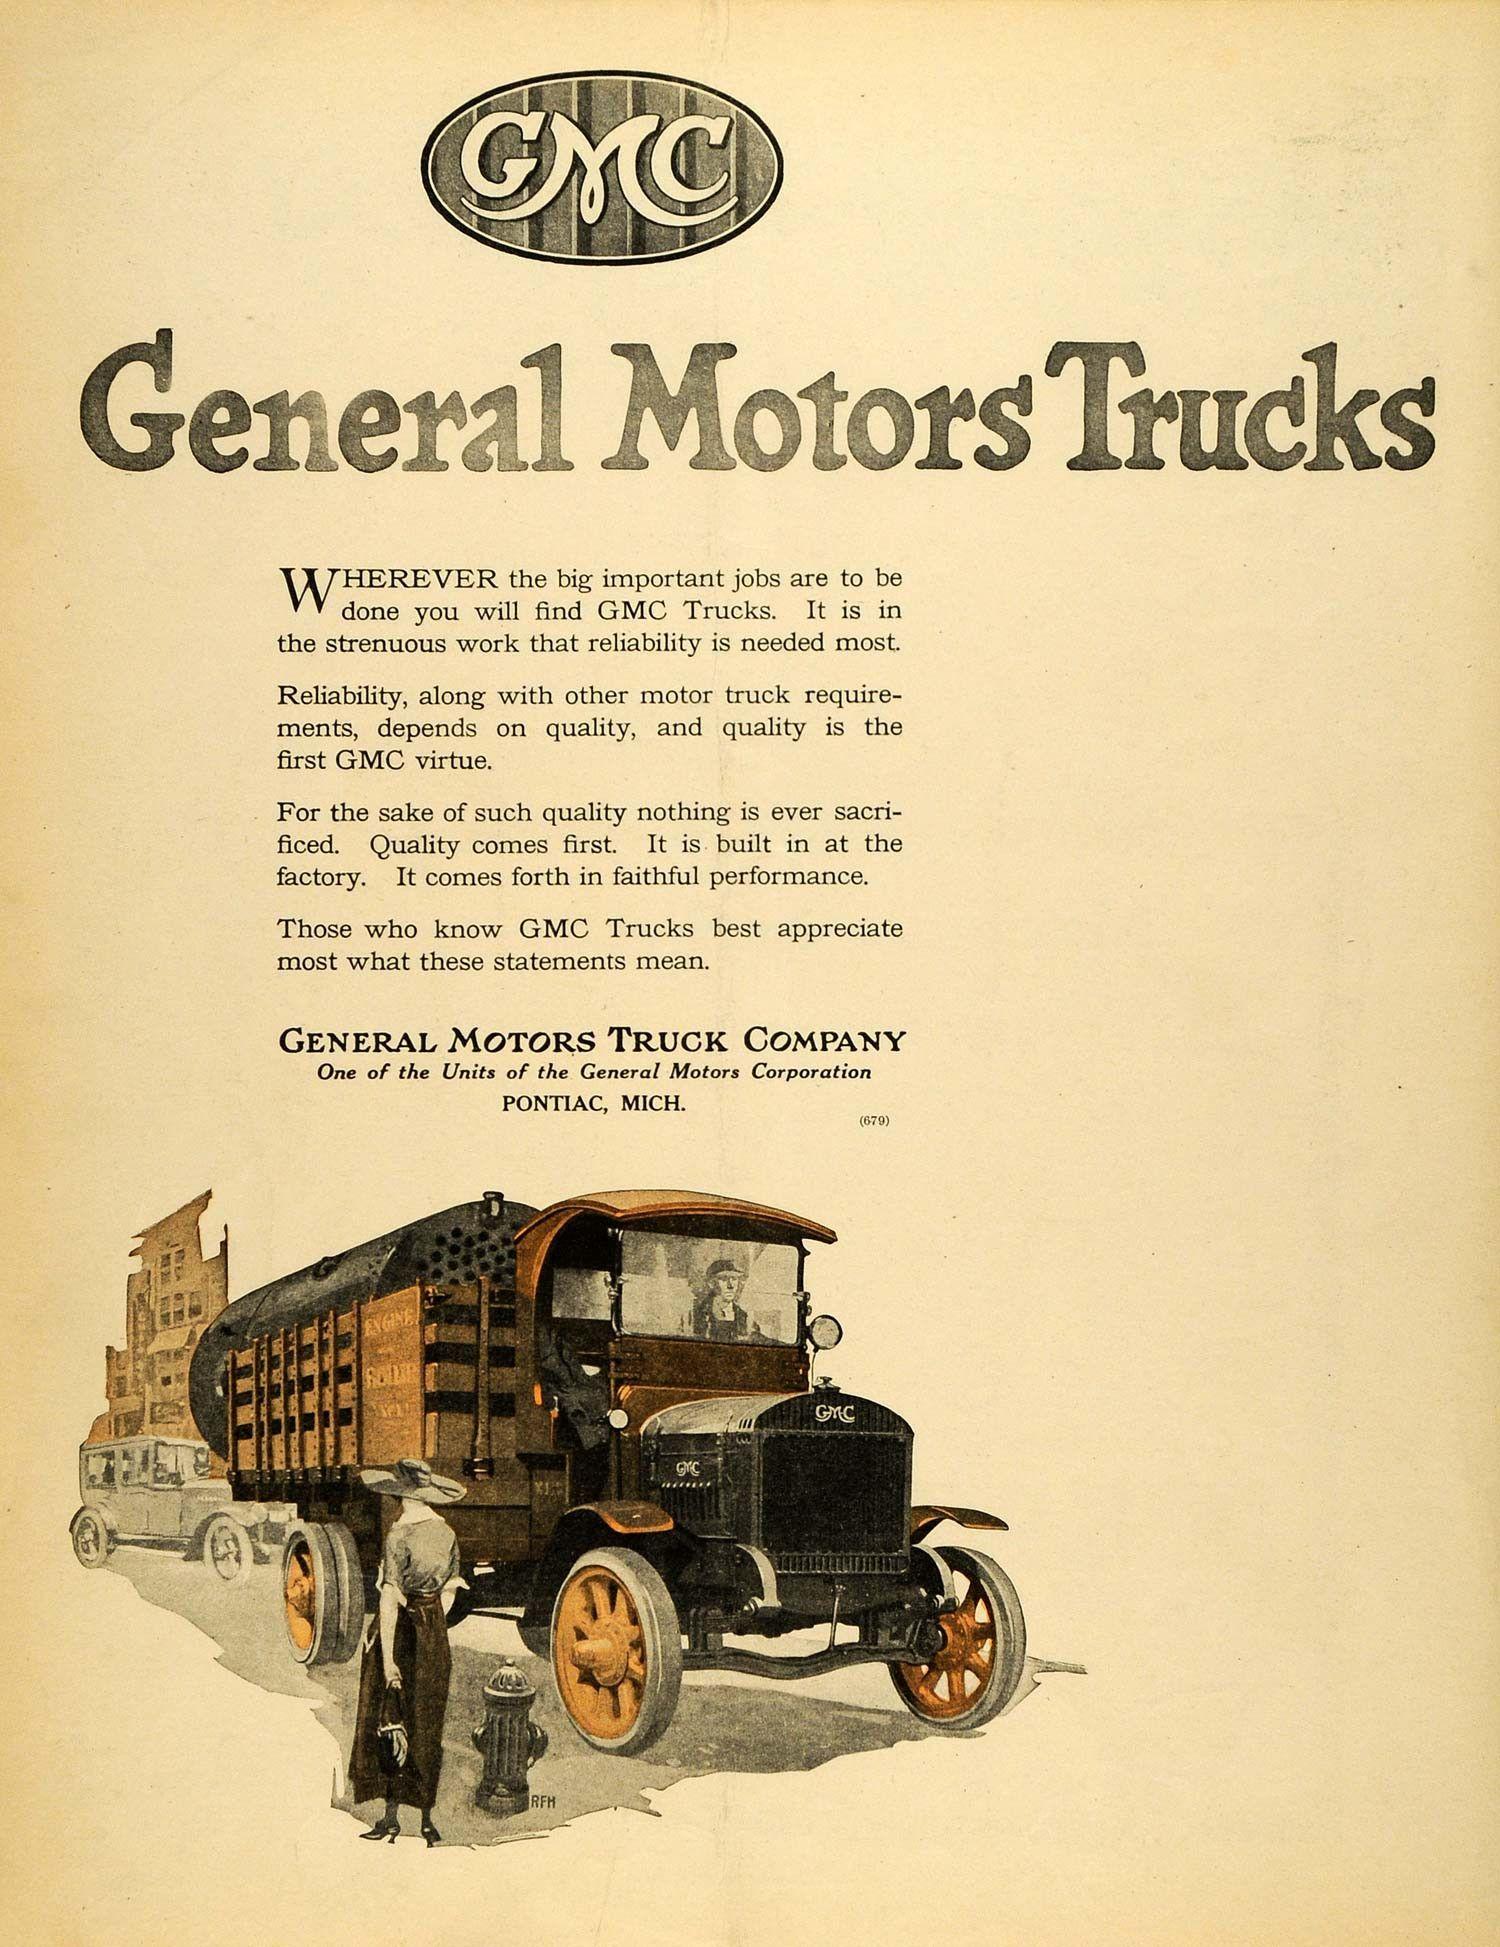 1920 Ad Gmc Pontiac Michigan General Motors Trucks Cargo Vintage